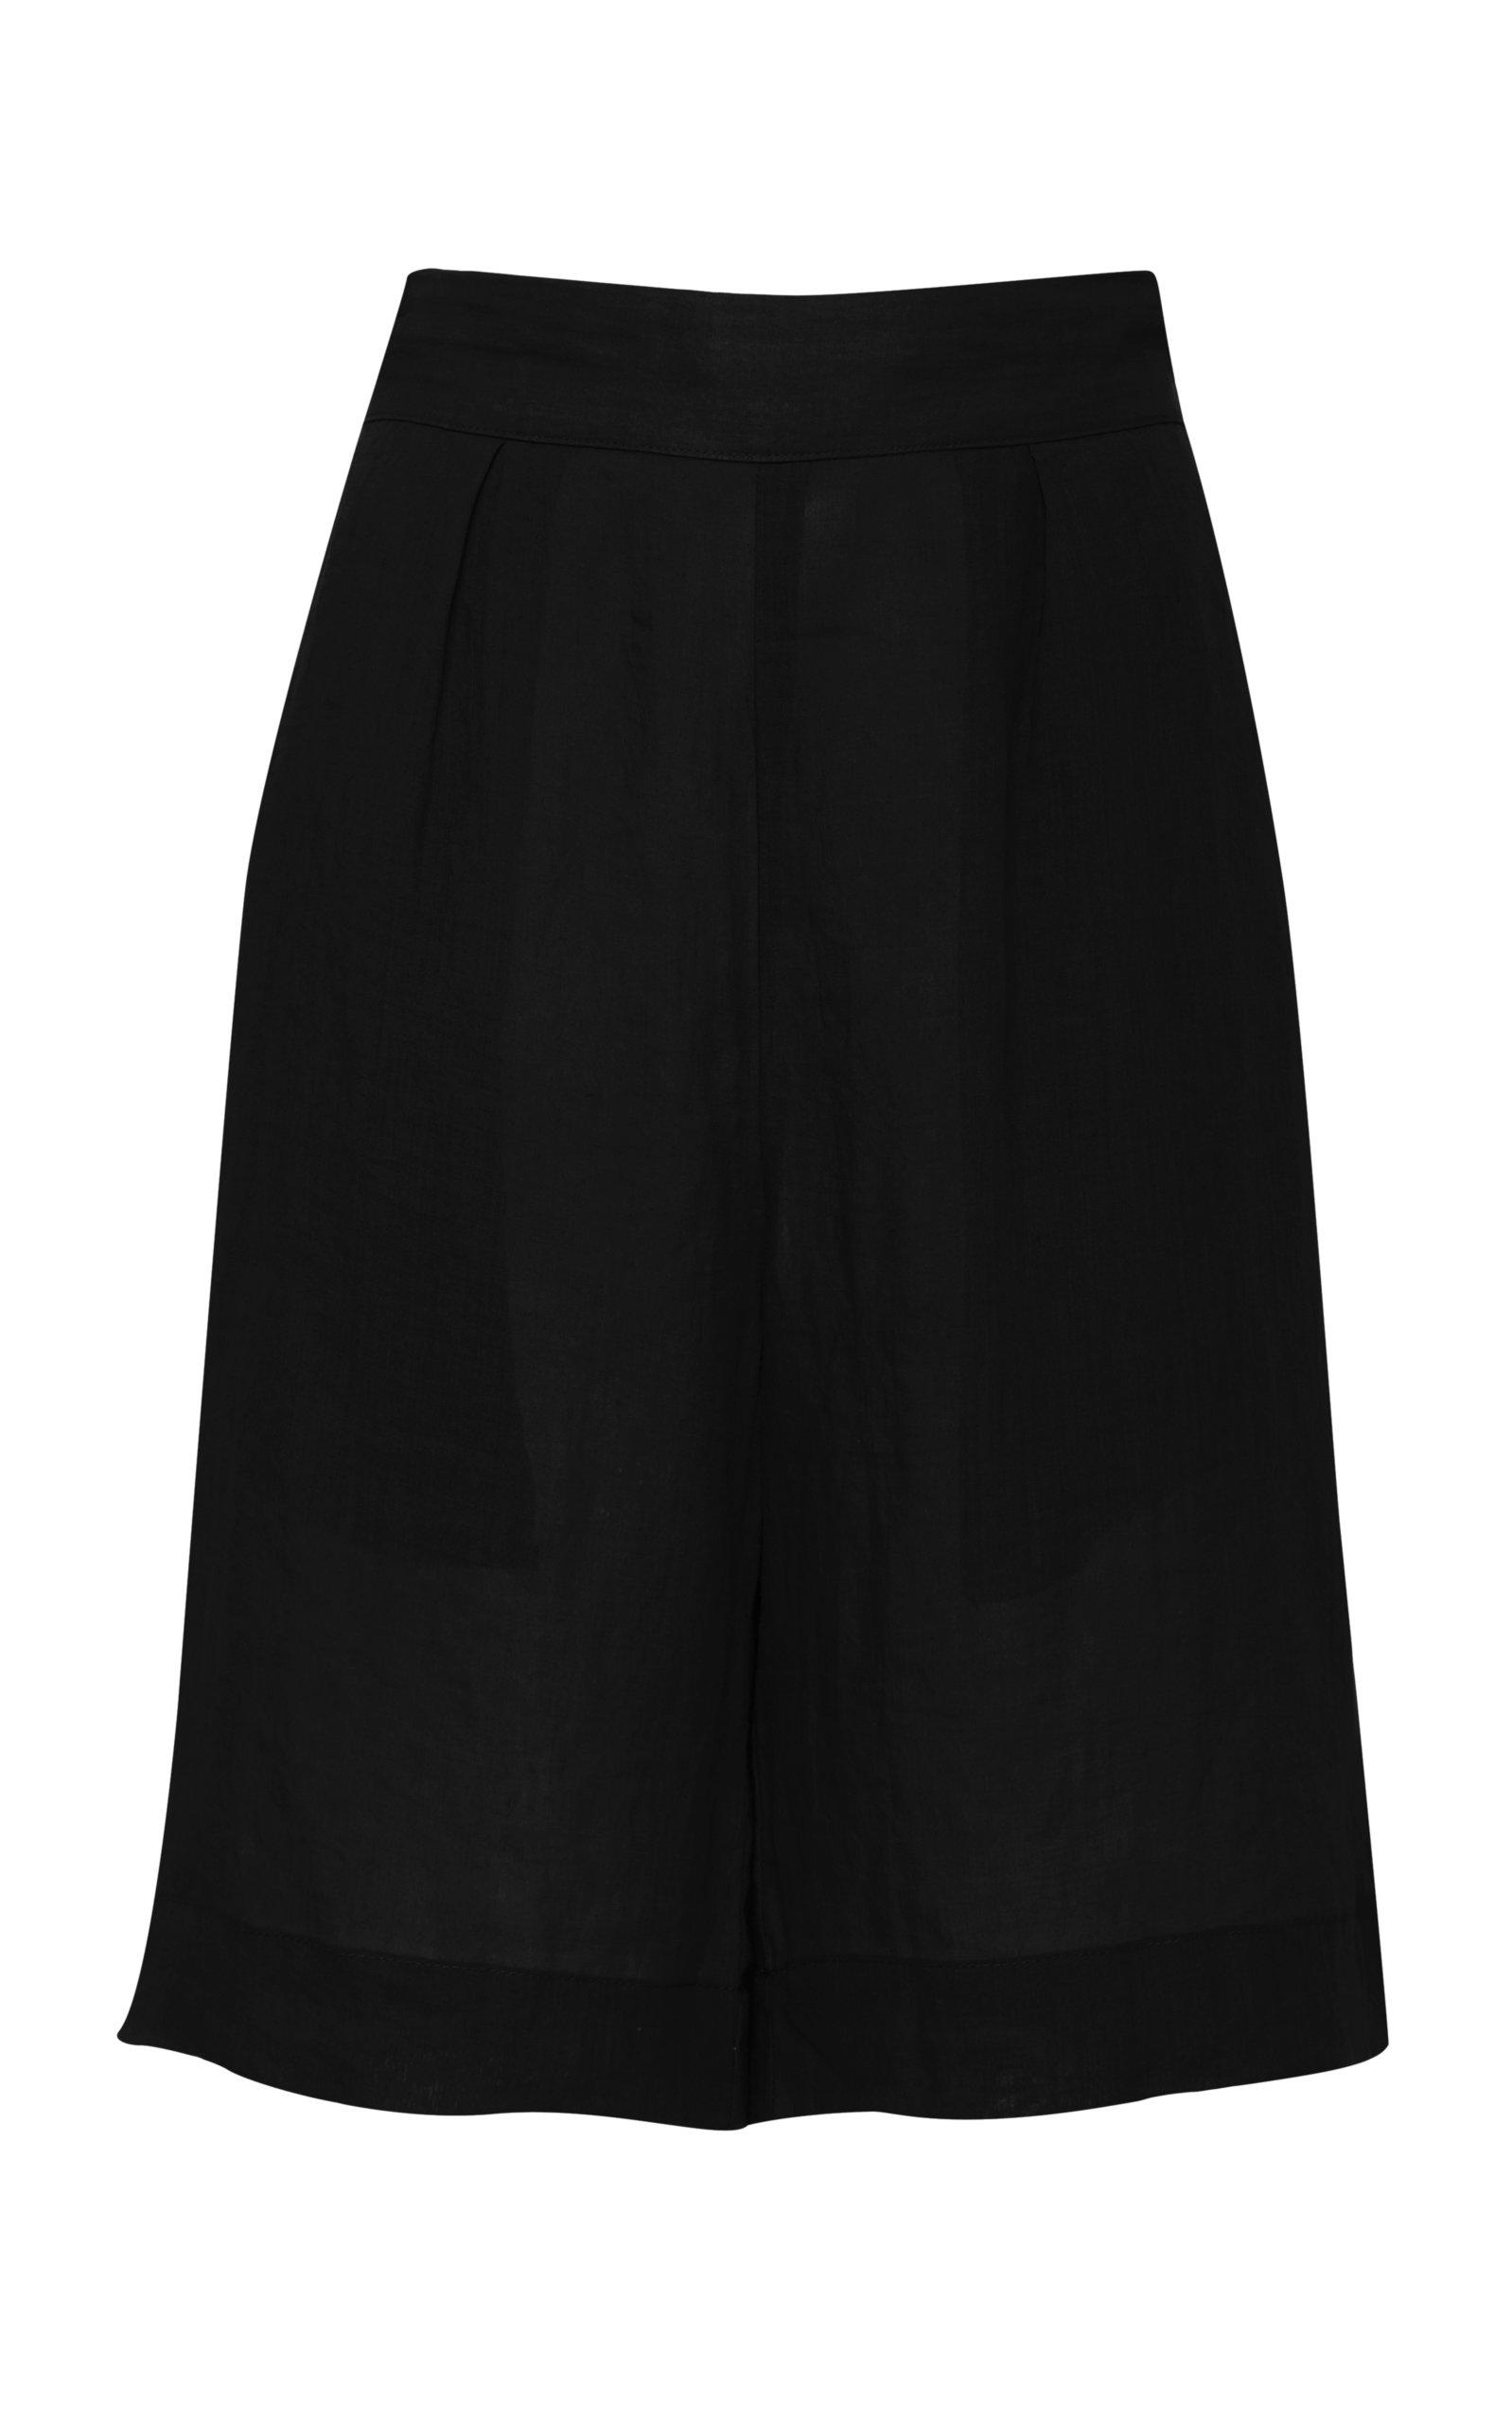 Women's The High Waisted Board Shorts